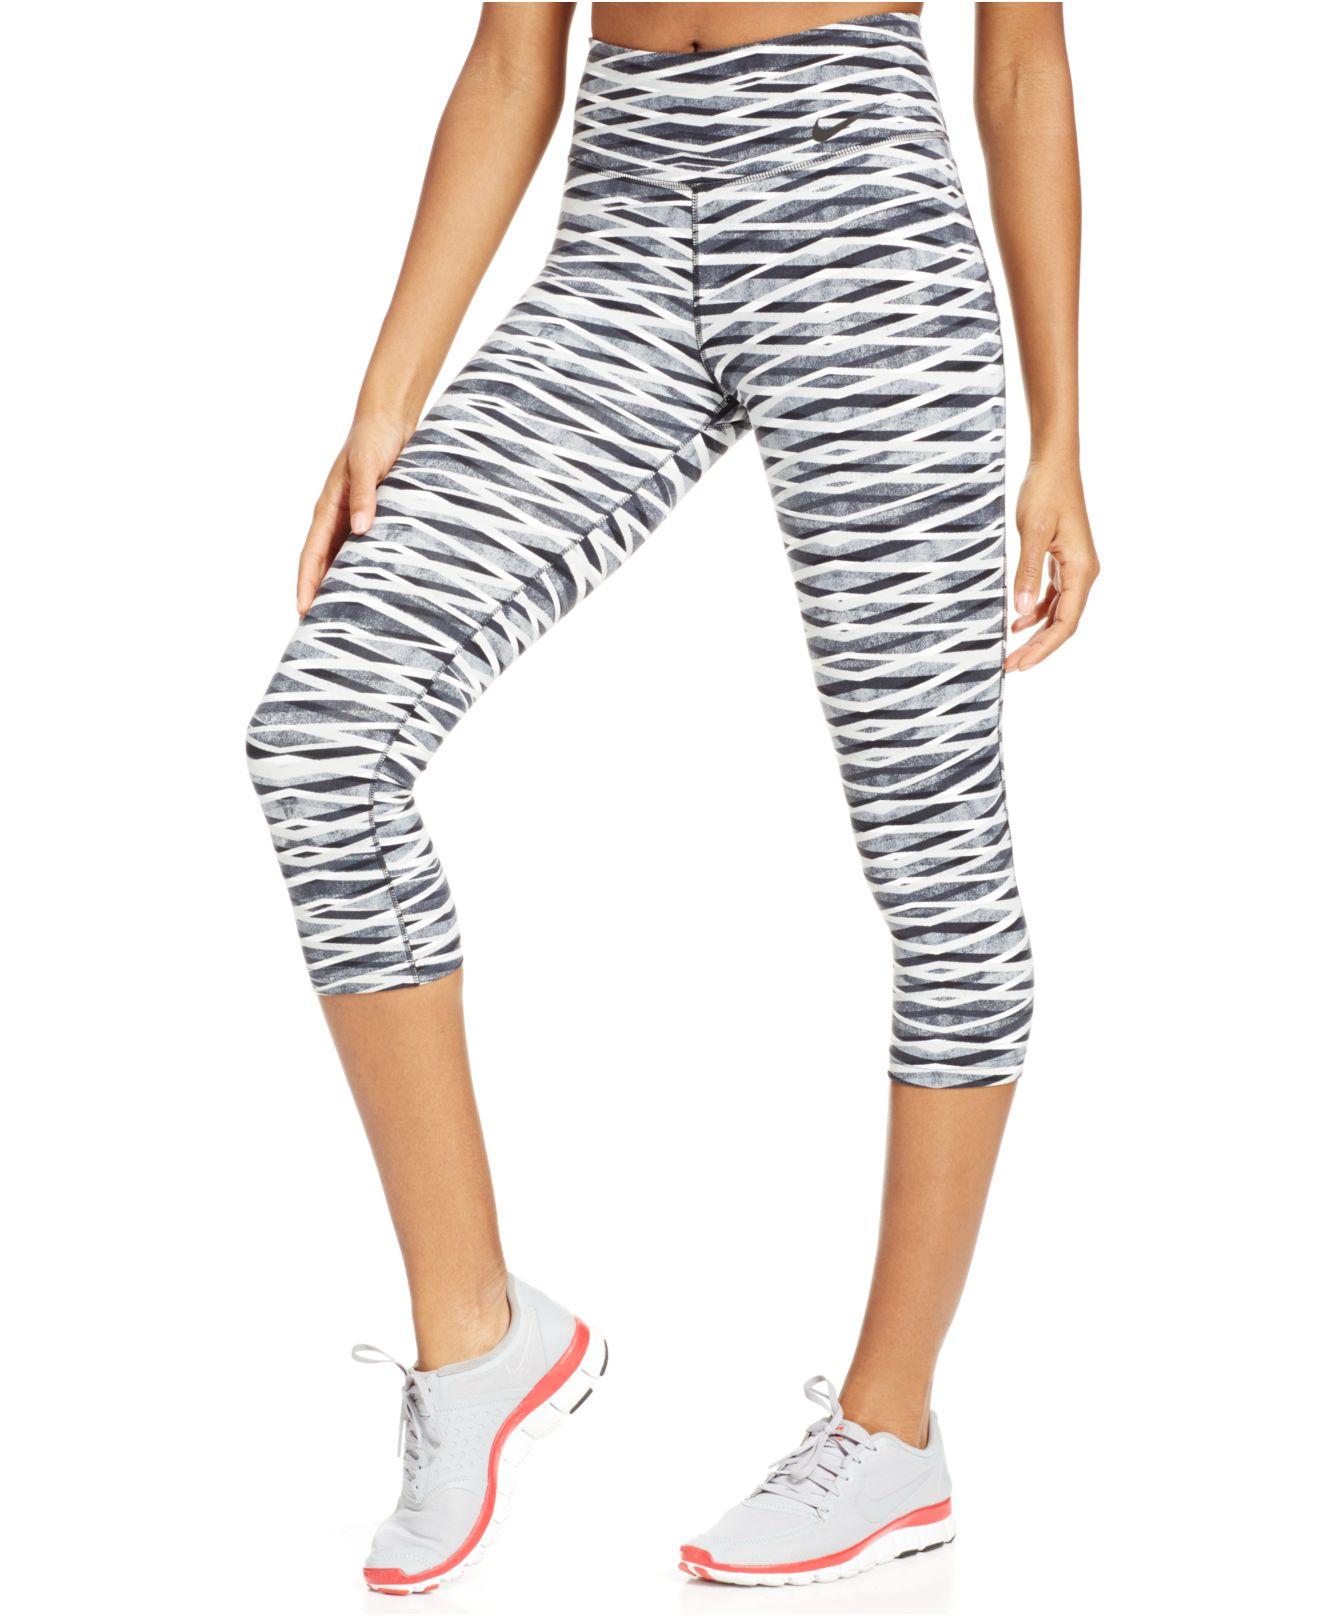 216f1bd40dd38 Nike Legendary Dri-fit Capri Leggings in Black - Lyst